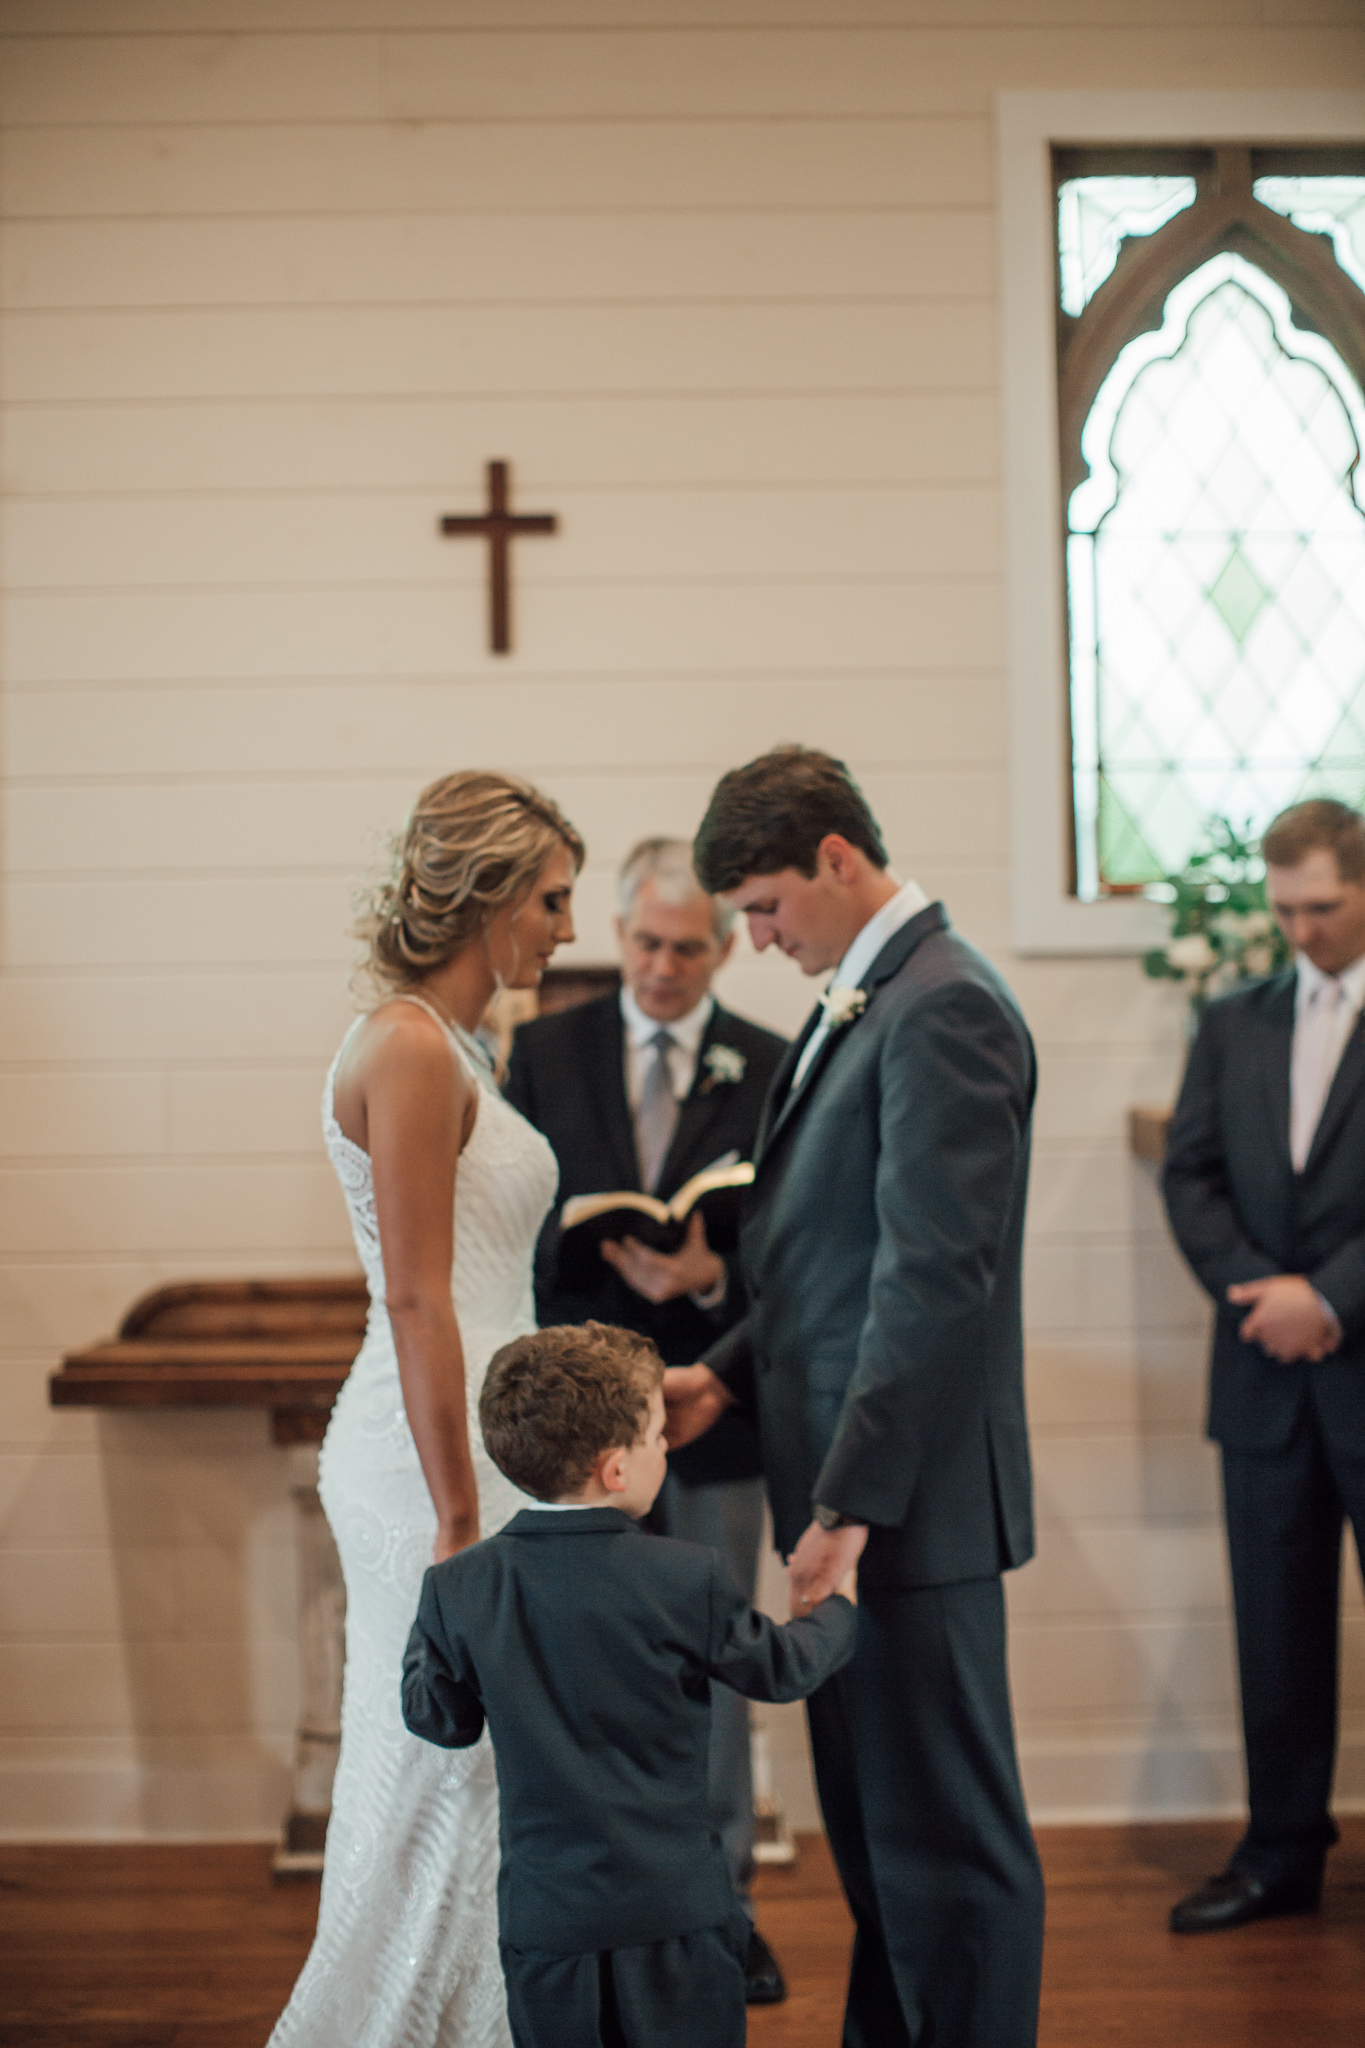 cassie-cook-photography-memphis-wedding-photographer-hedge-farm-wedding-venue-231.jpg